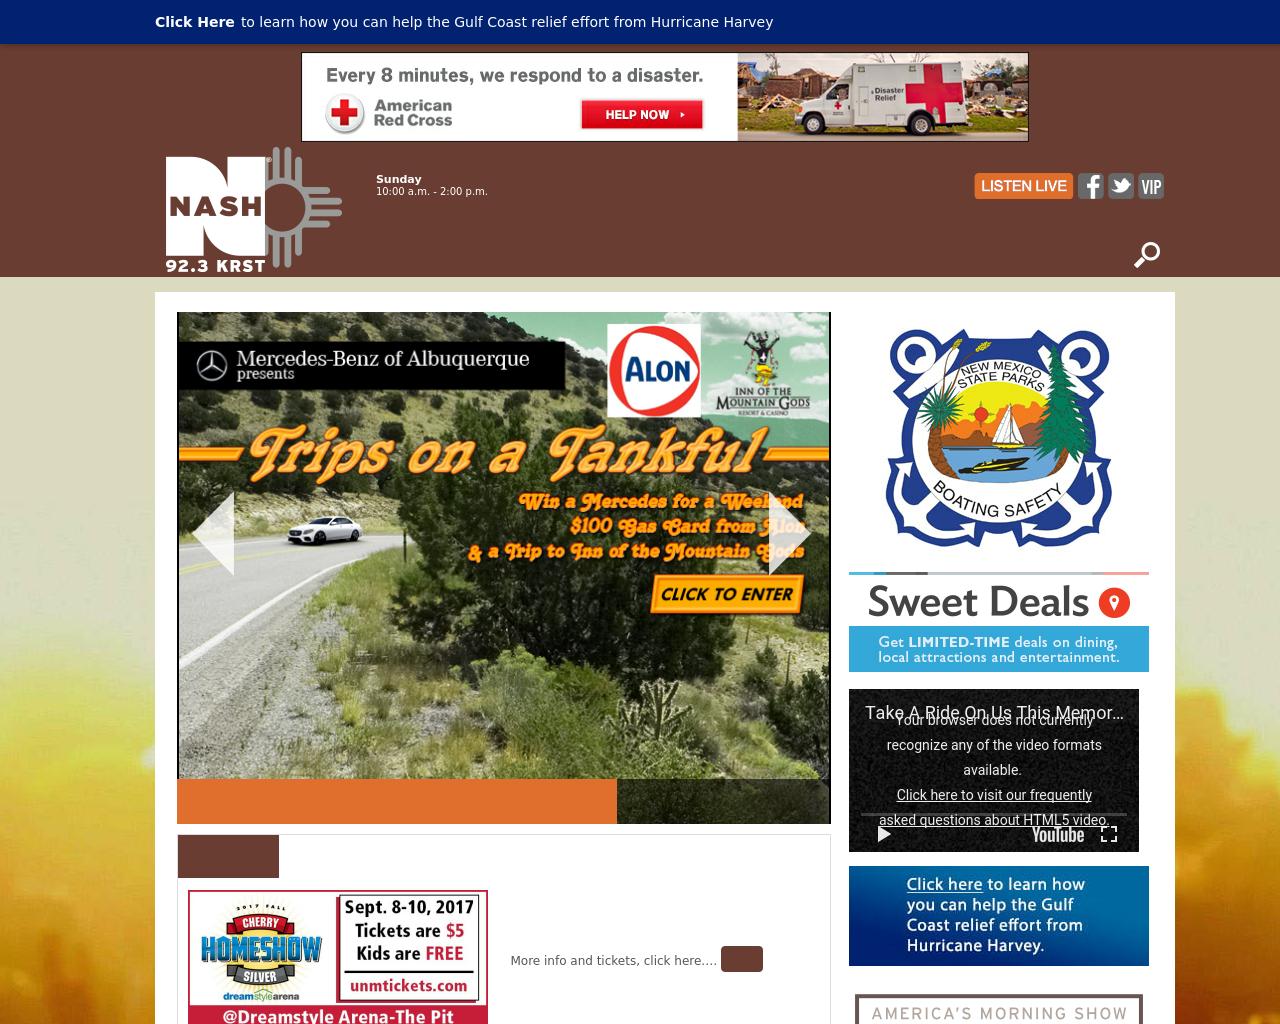 Nash-FM-92.3-KRST-Advertising-Reviews-Pricing